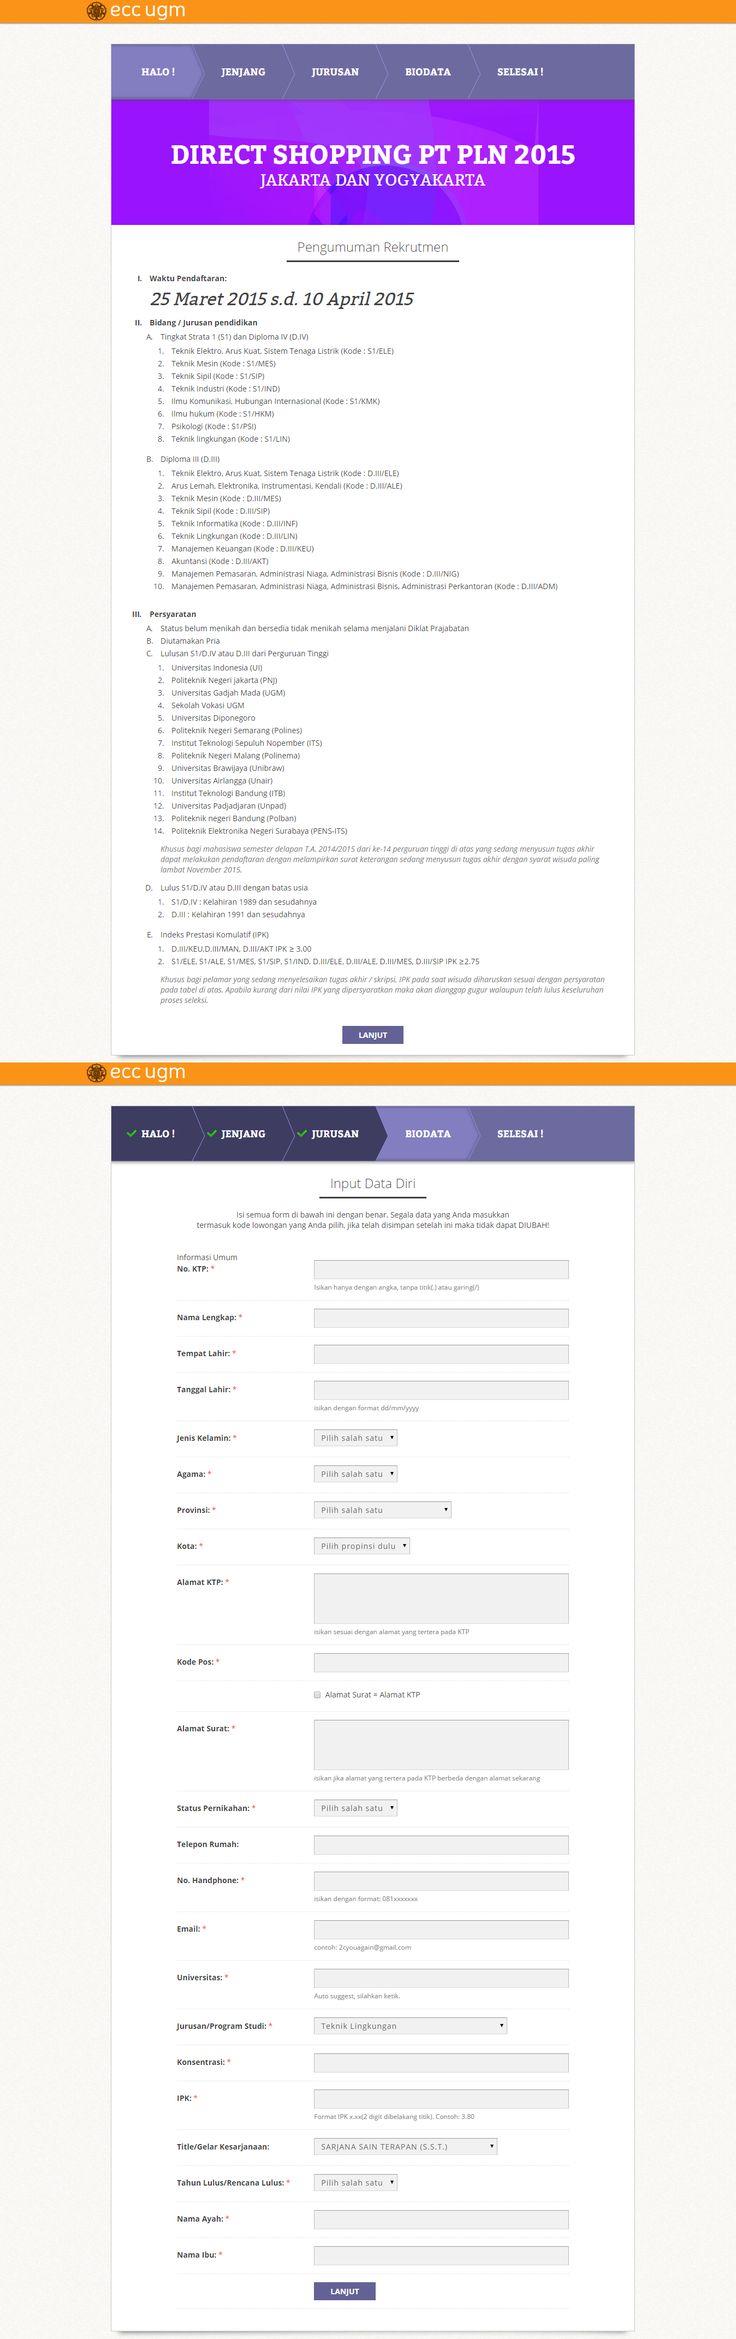 Direct Shopping PT PLN 2015 #Yii #ECC2 #FormOnline #Recruitment #PLN #ECCUGM